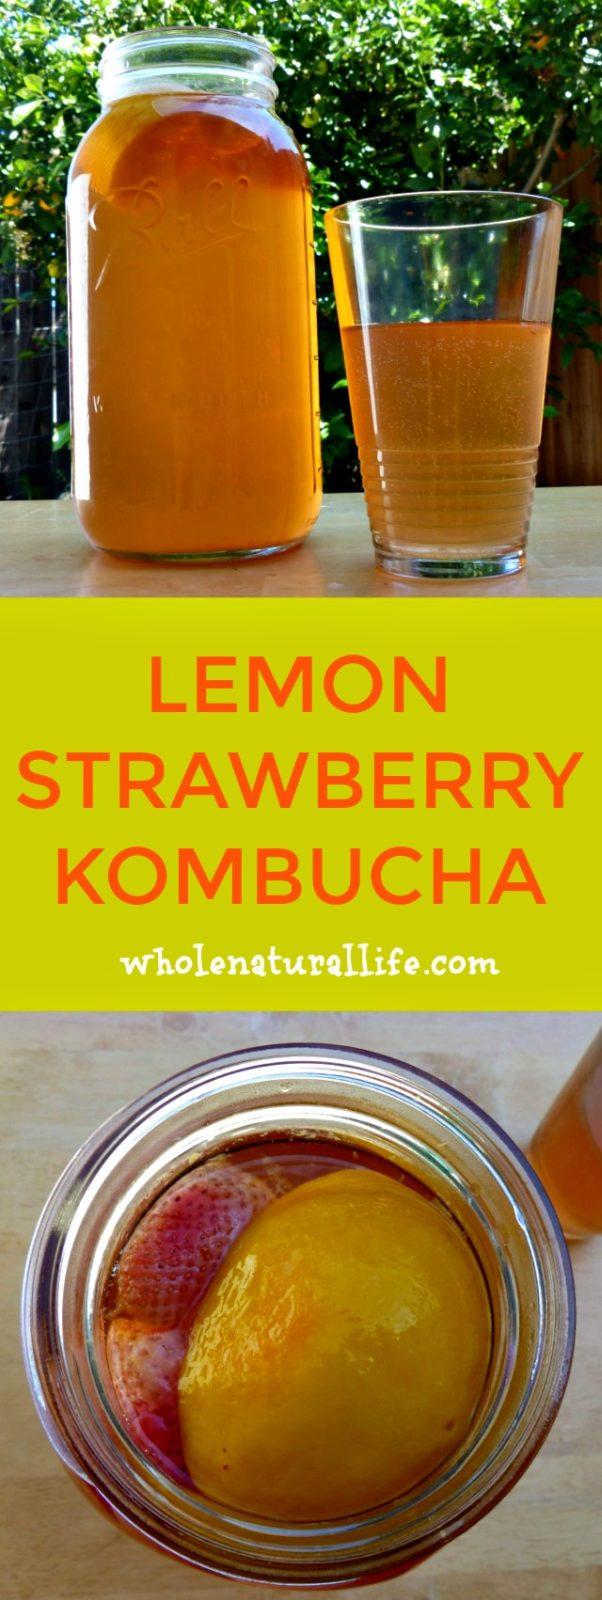 Kombucha second ferment | Kombucha flavors | DIY kombucha | Homemade kombucha recipe